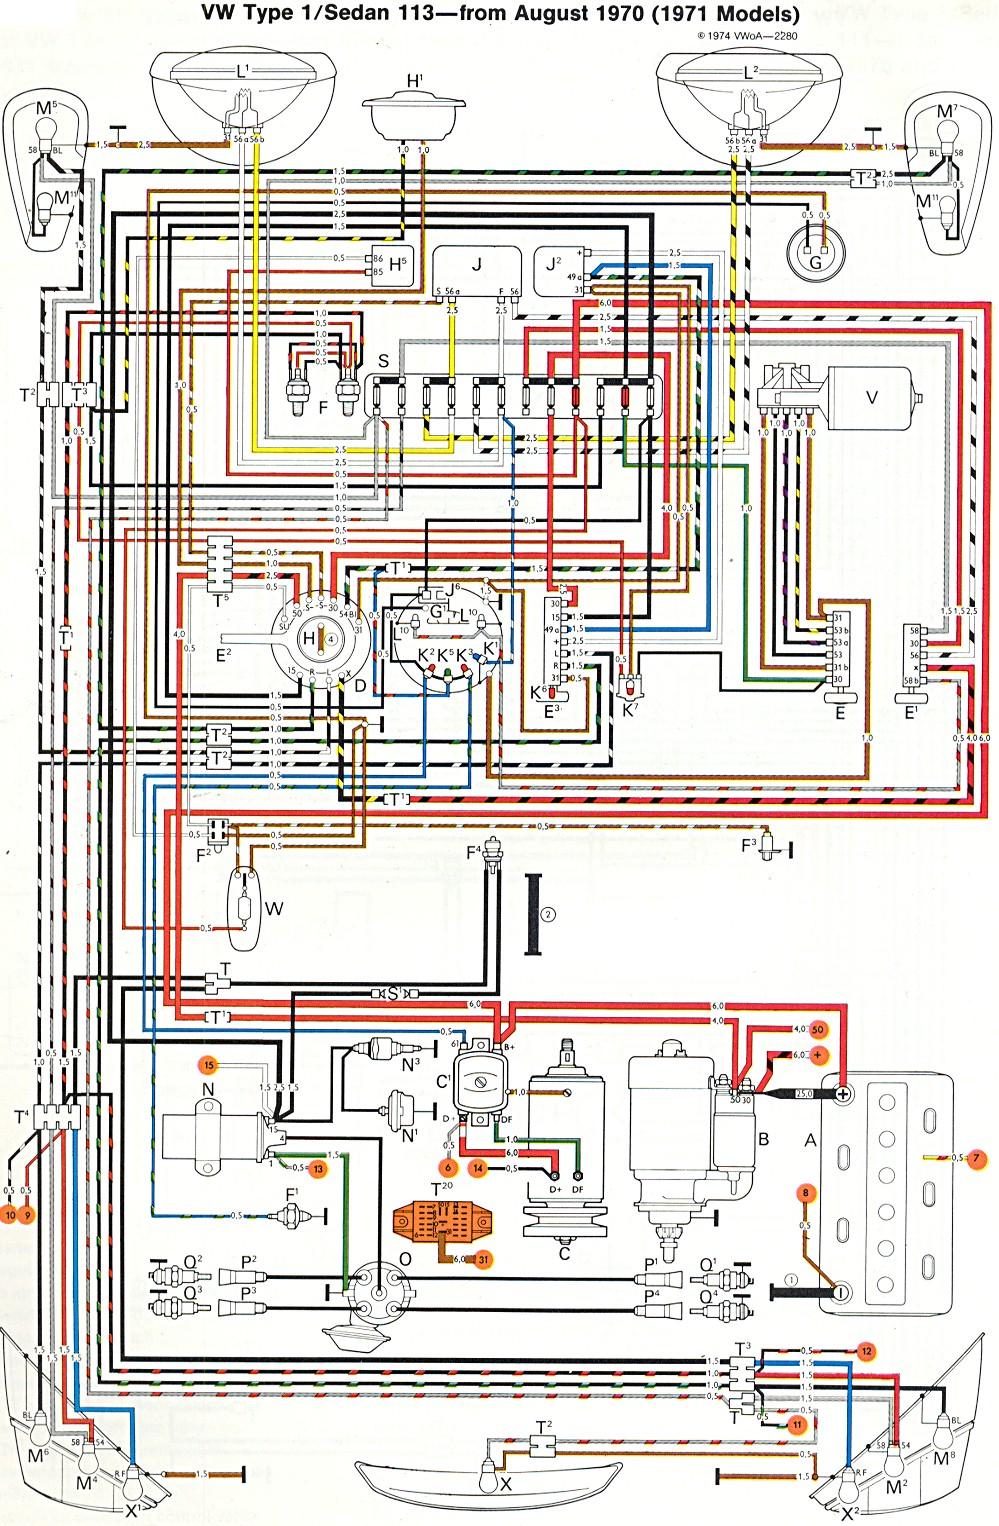 bug_super_71?resize\\\\\\\\\\\\\=665%2C1016 denso 210 0406 alternator wiring diagram wiring diagrams Bosch Alternator Wiring Diagram at alyssarenee.co